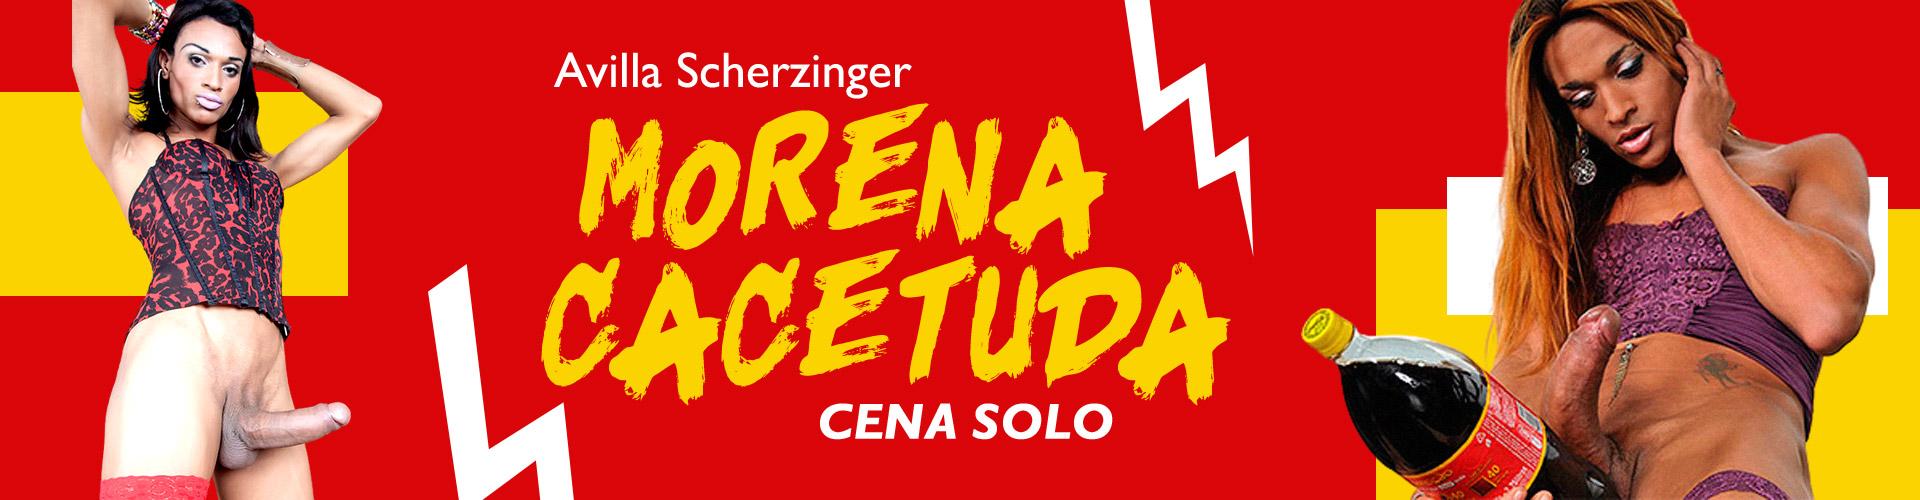 Morena Cacetuda